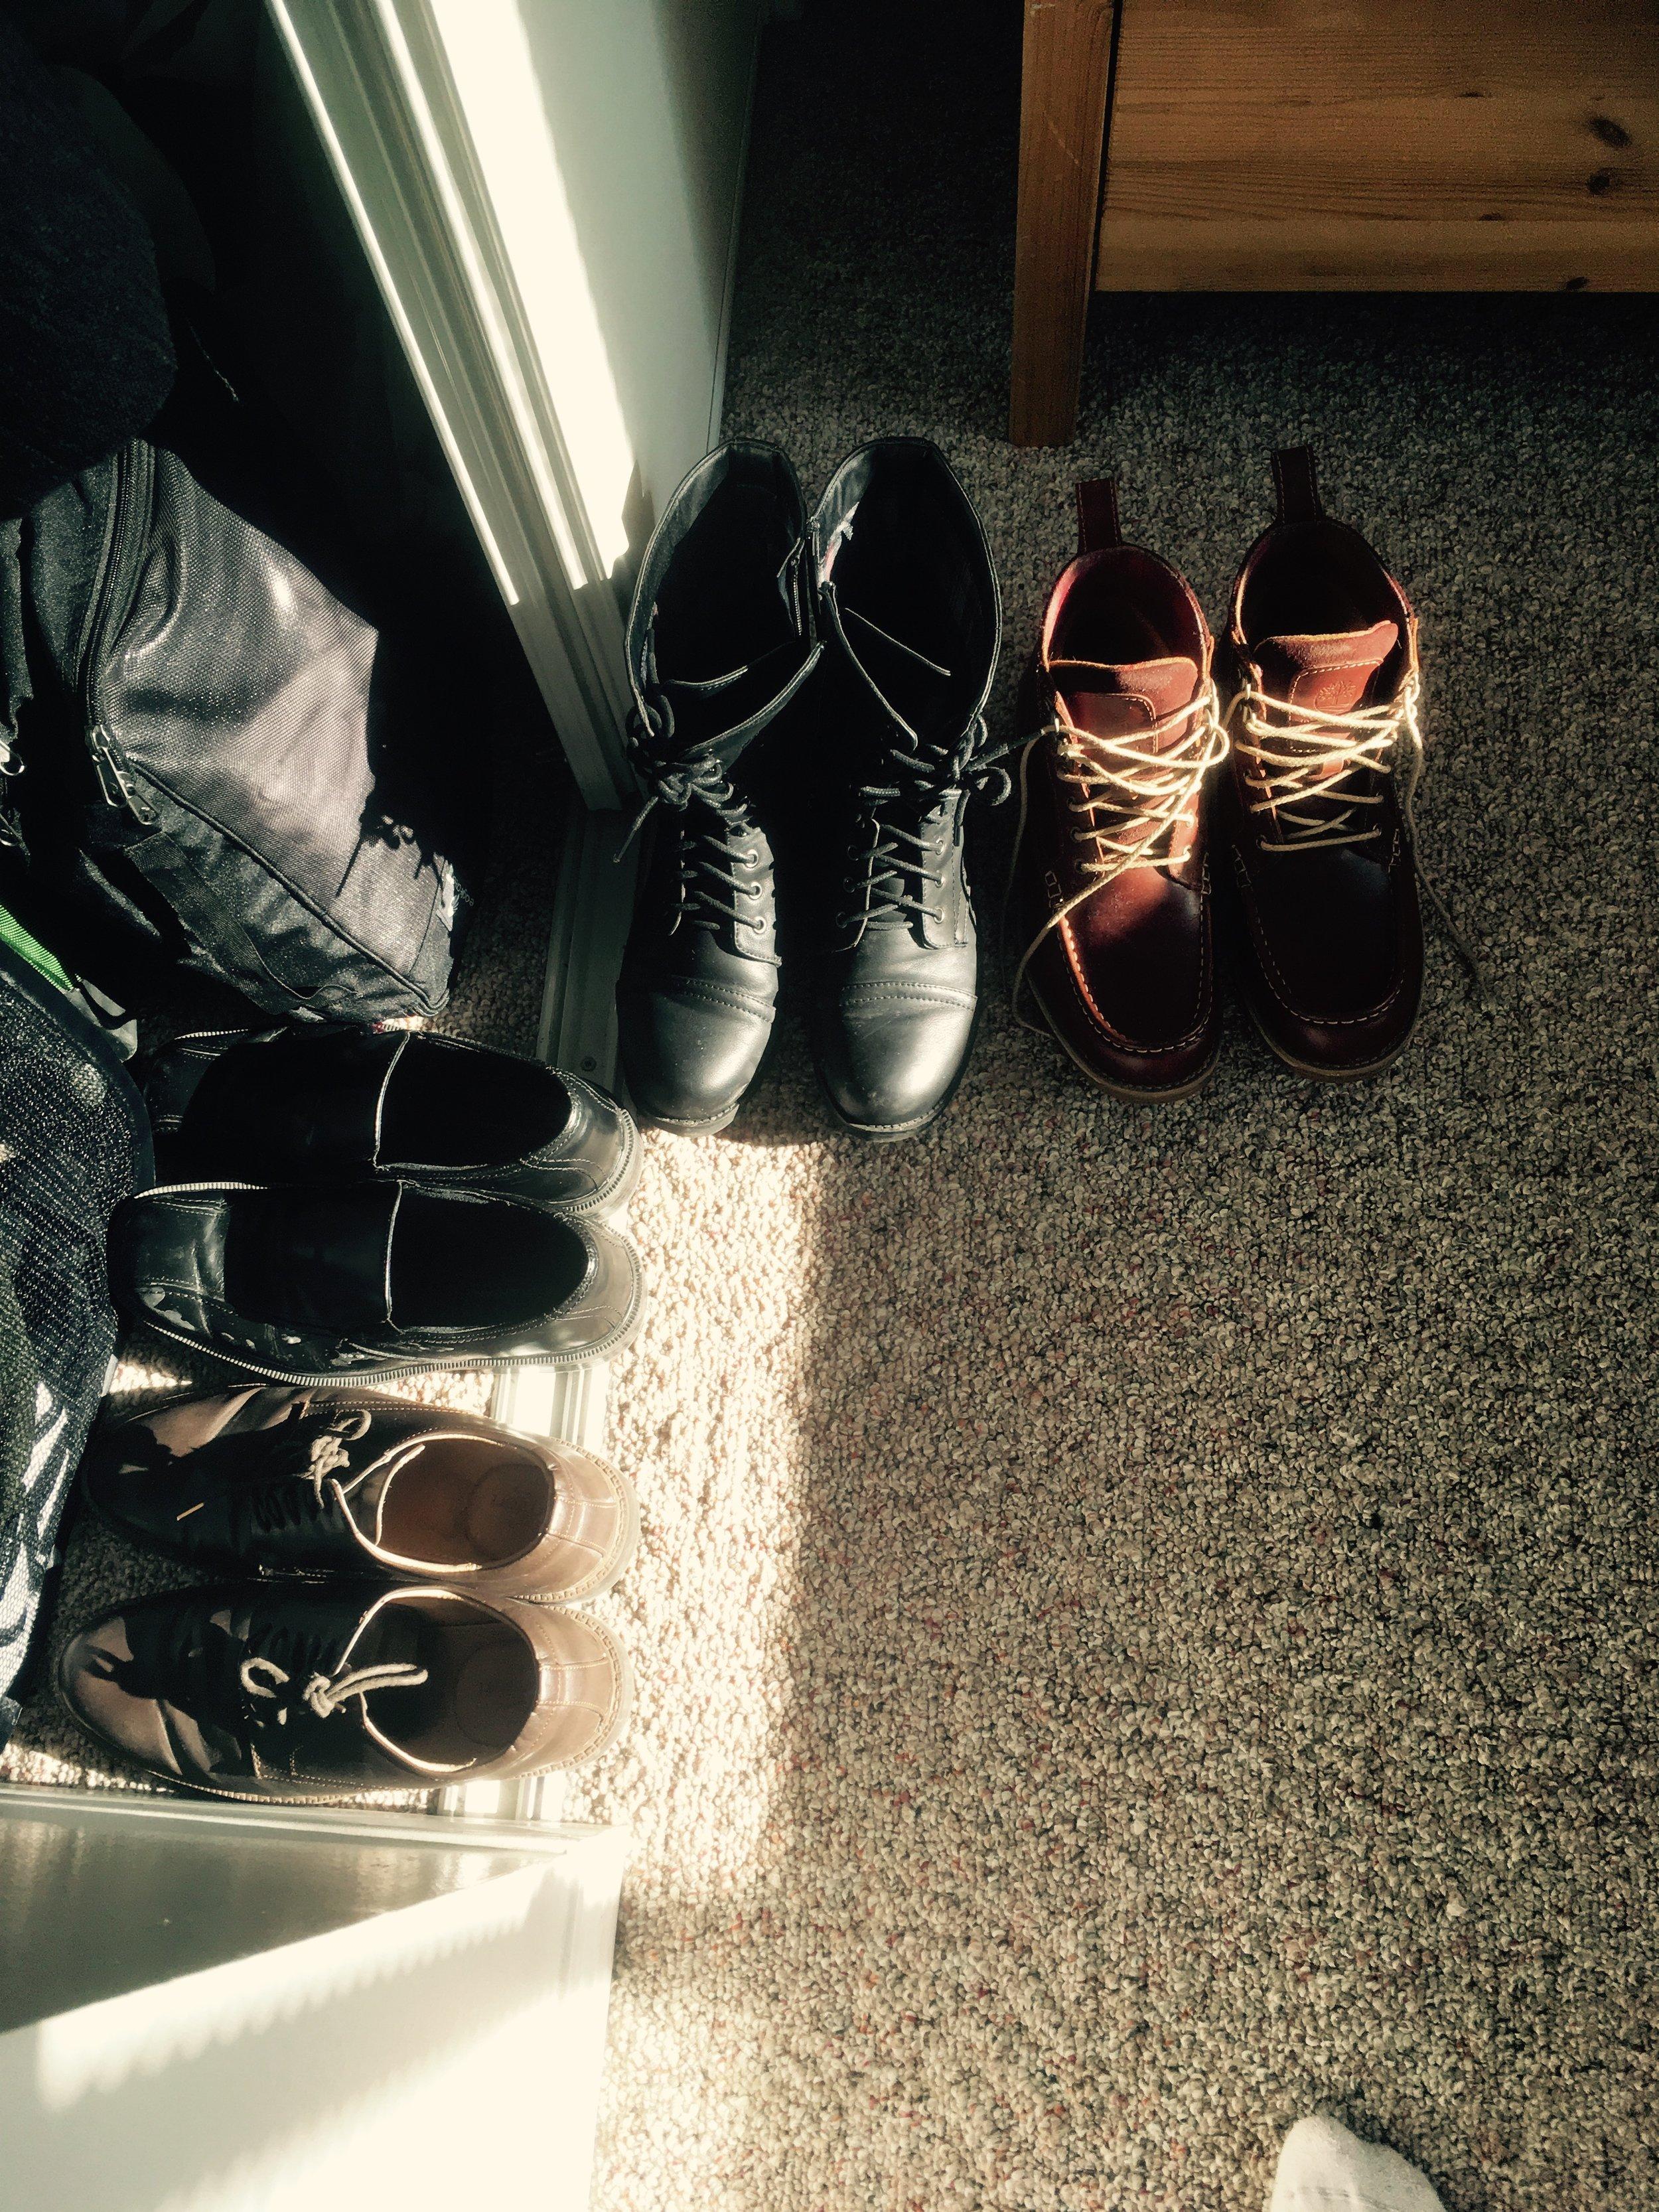 ClosetShoes.jpg